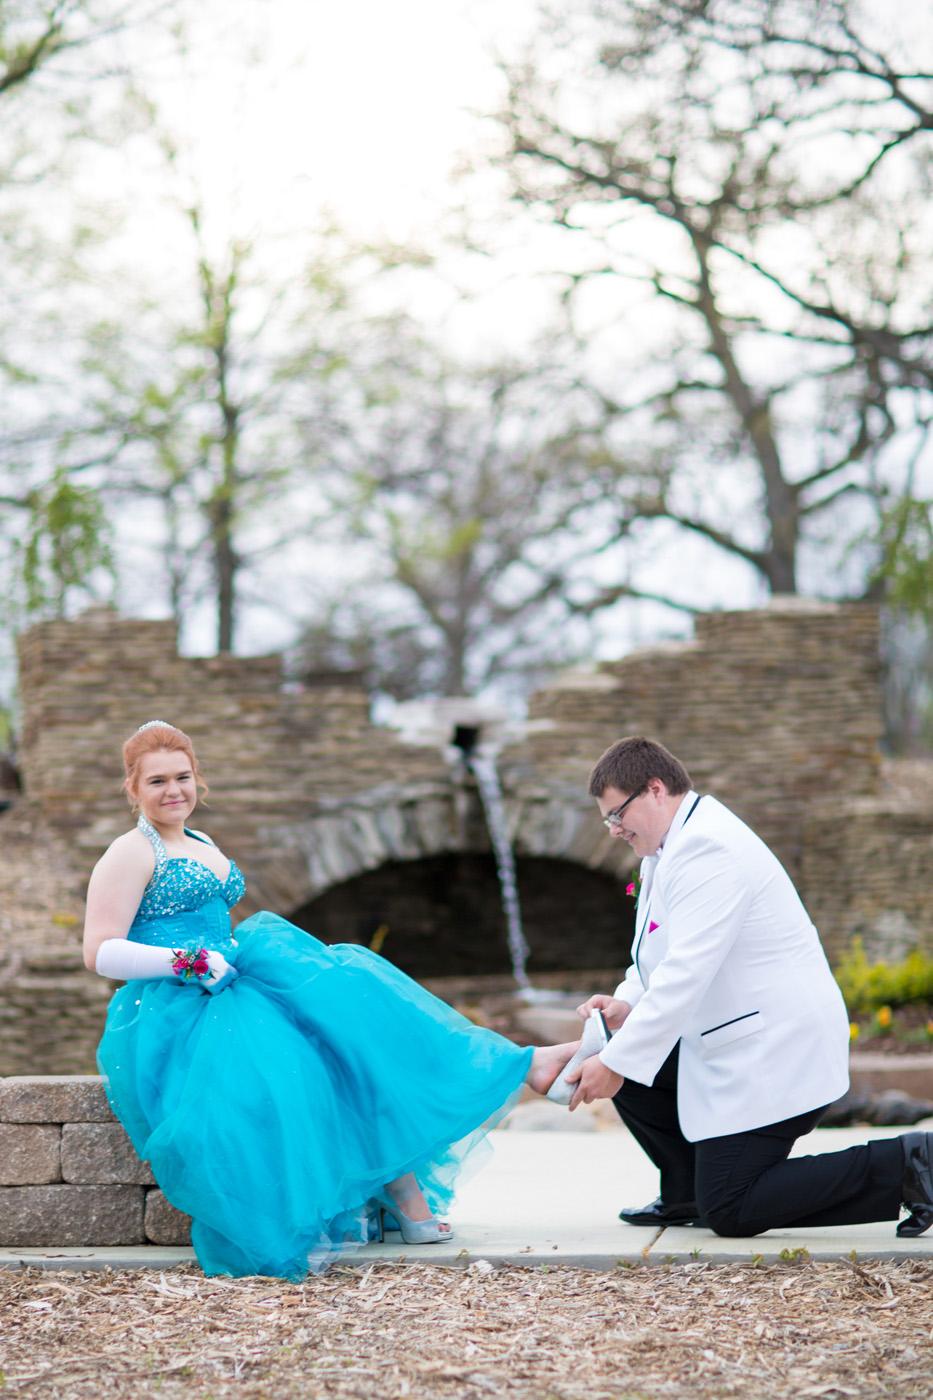 Garrett & Helen Prom 2014 185.jpg